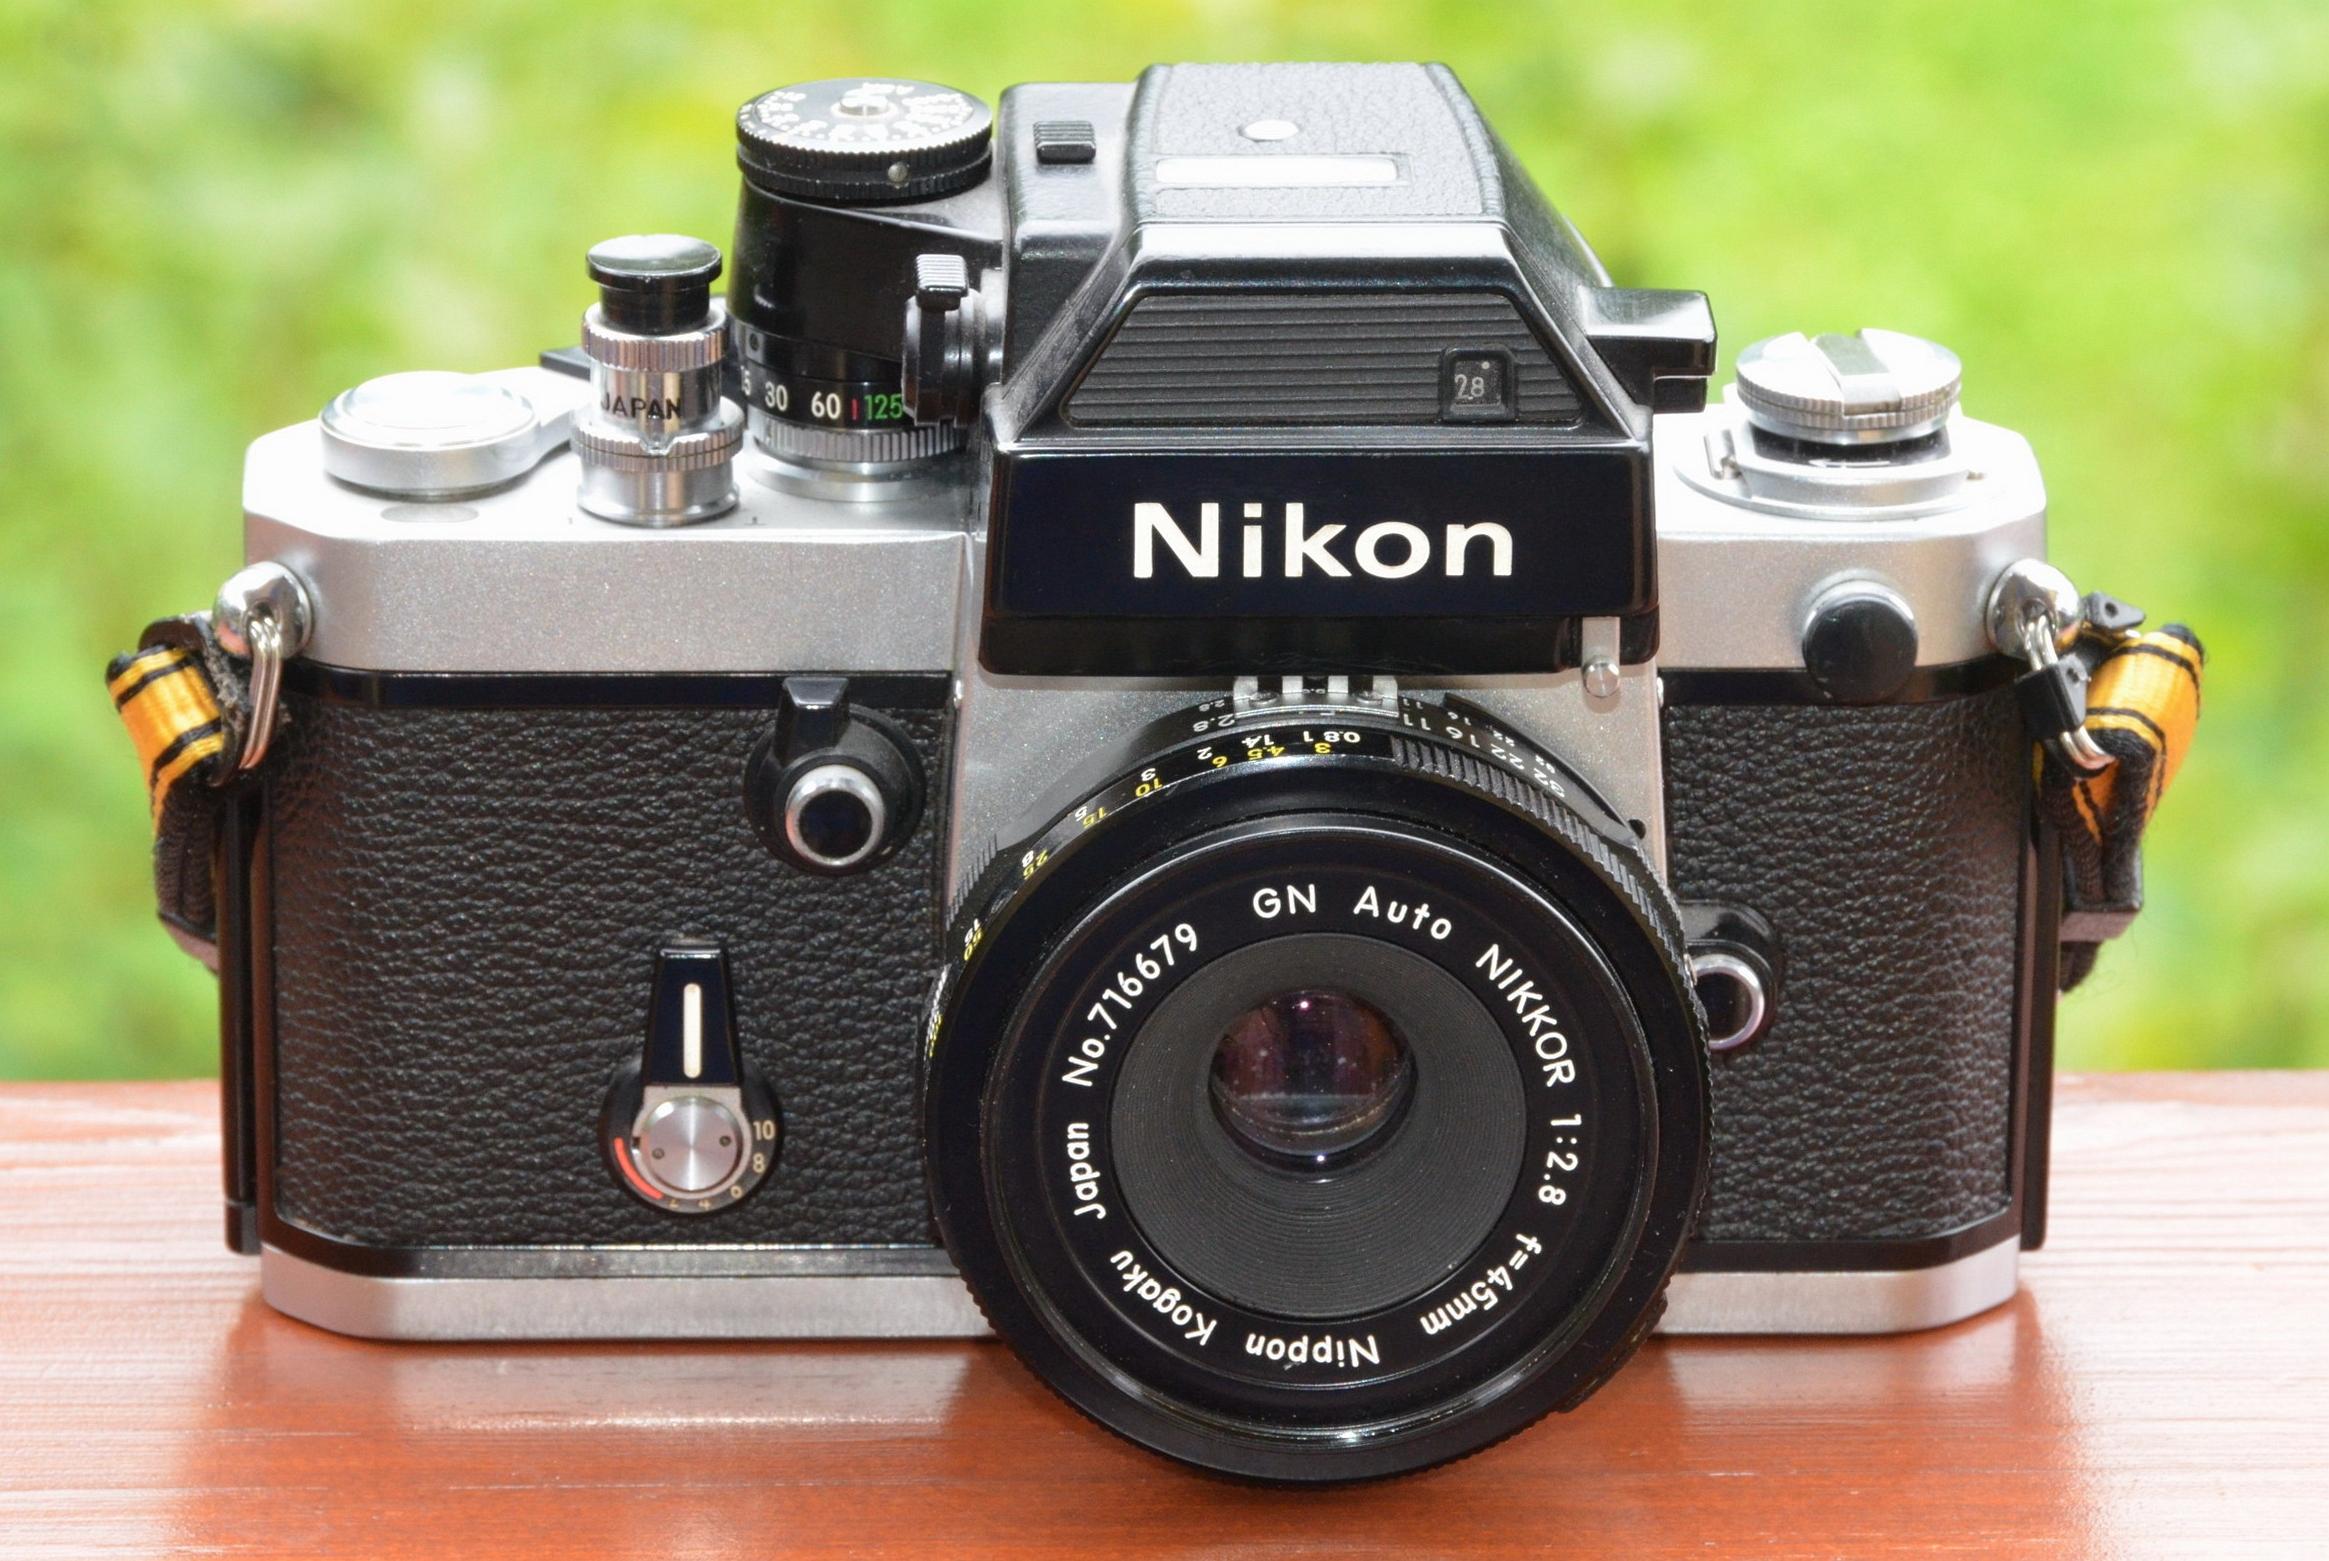 file nikon f2 sb slr camera with gn auto nikkor 2 8 f 45mm lens jpg rh commons wikimedia org nikon fe camera manual nikon f photomic camera manual